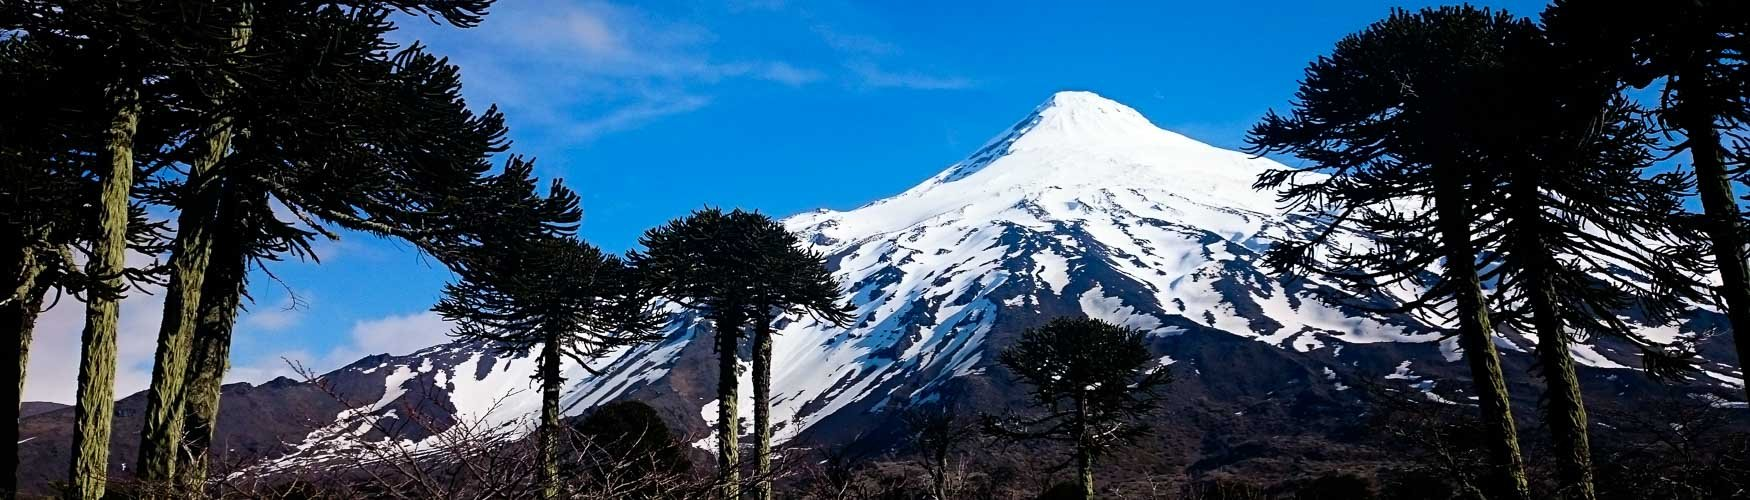 Skitour Chile, Skitour Vulkan, Skireise Chile